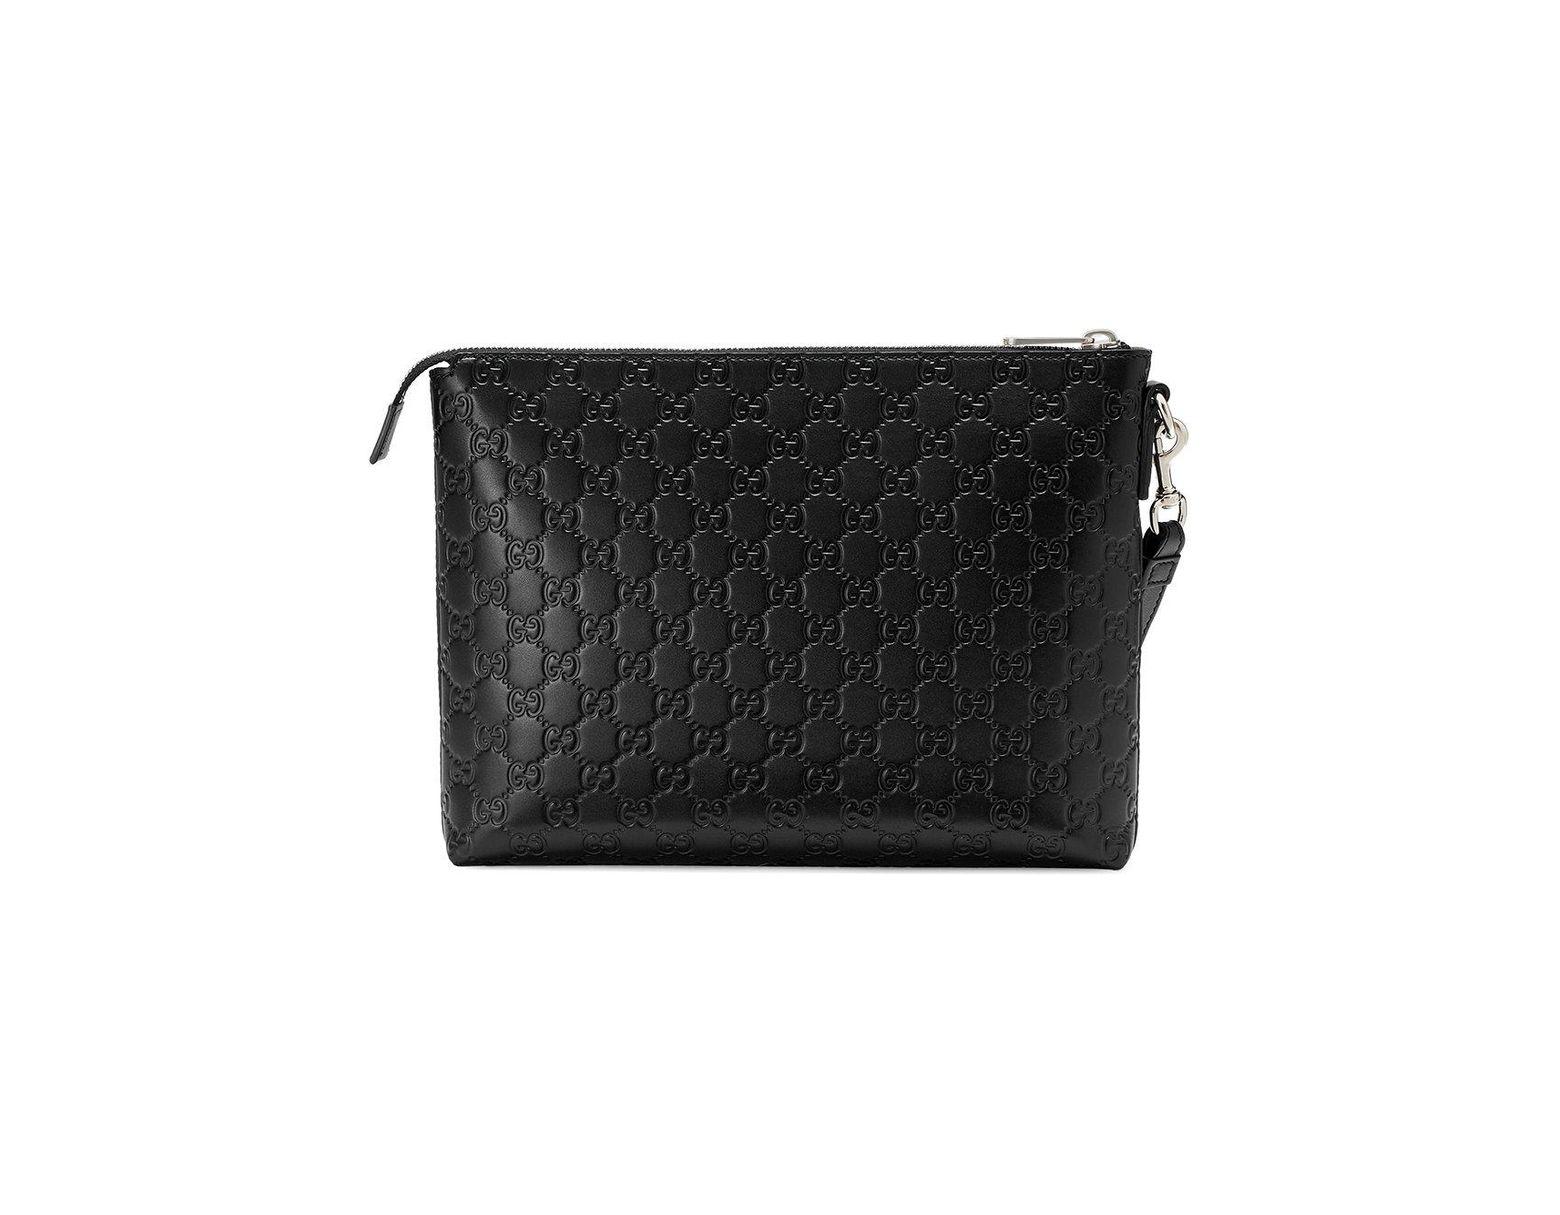 918e2bd4bed Gucci Signature Soft Men's Bag in Black for Men - Lyst